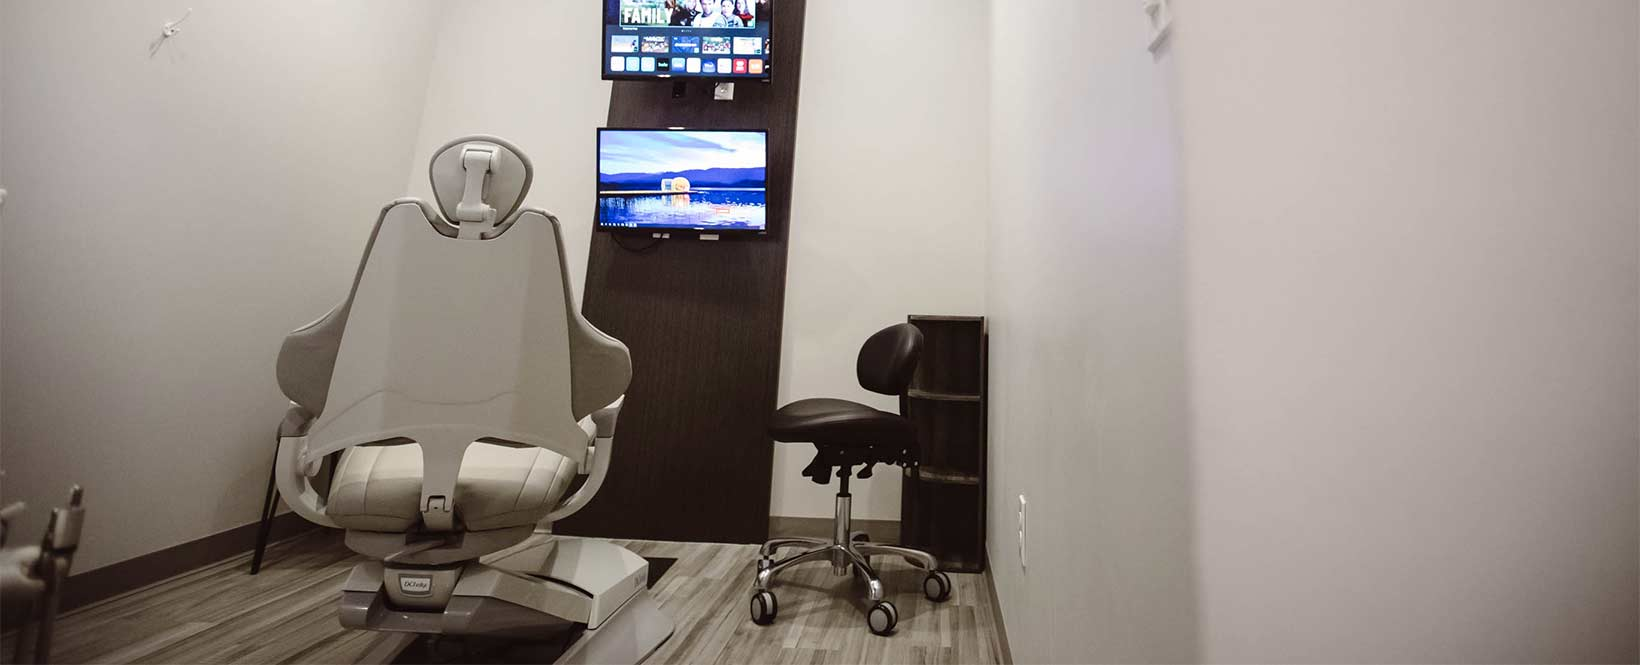 Photo of a treatment room at Bria Dental